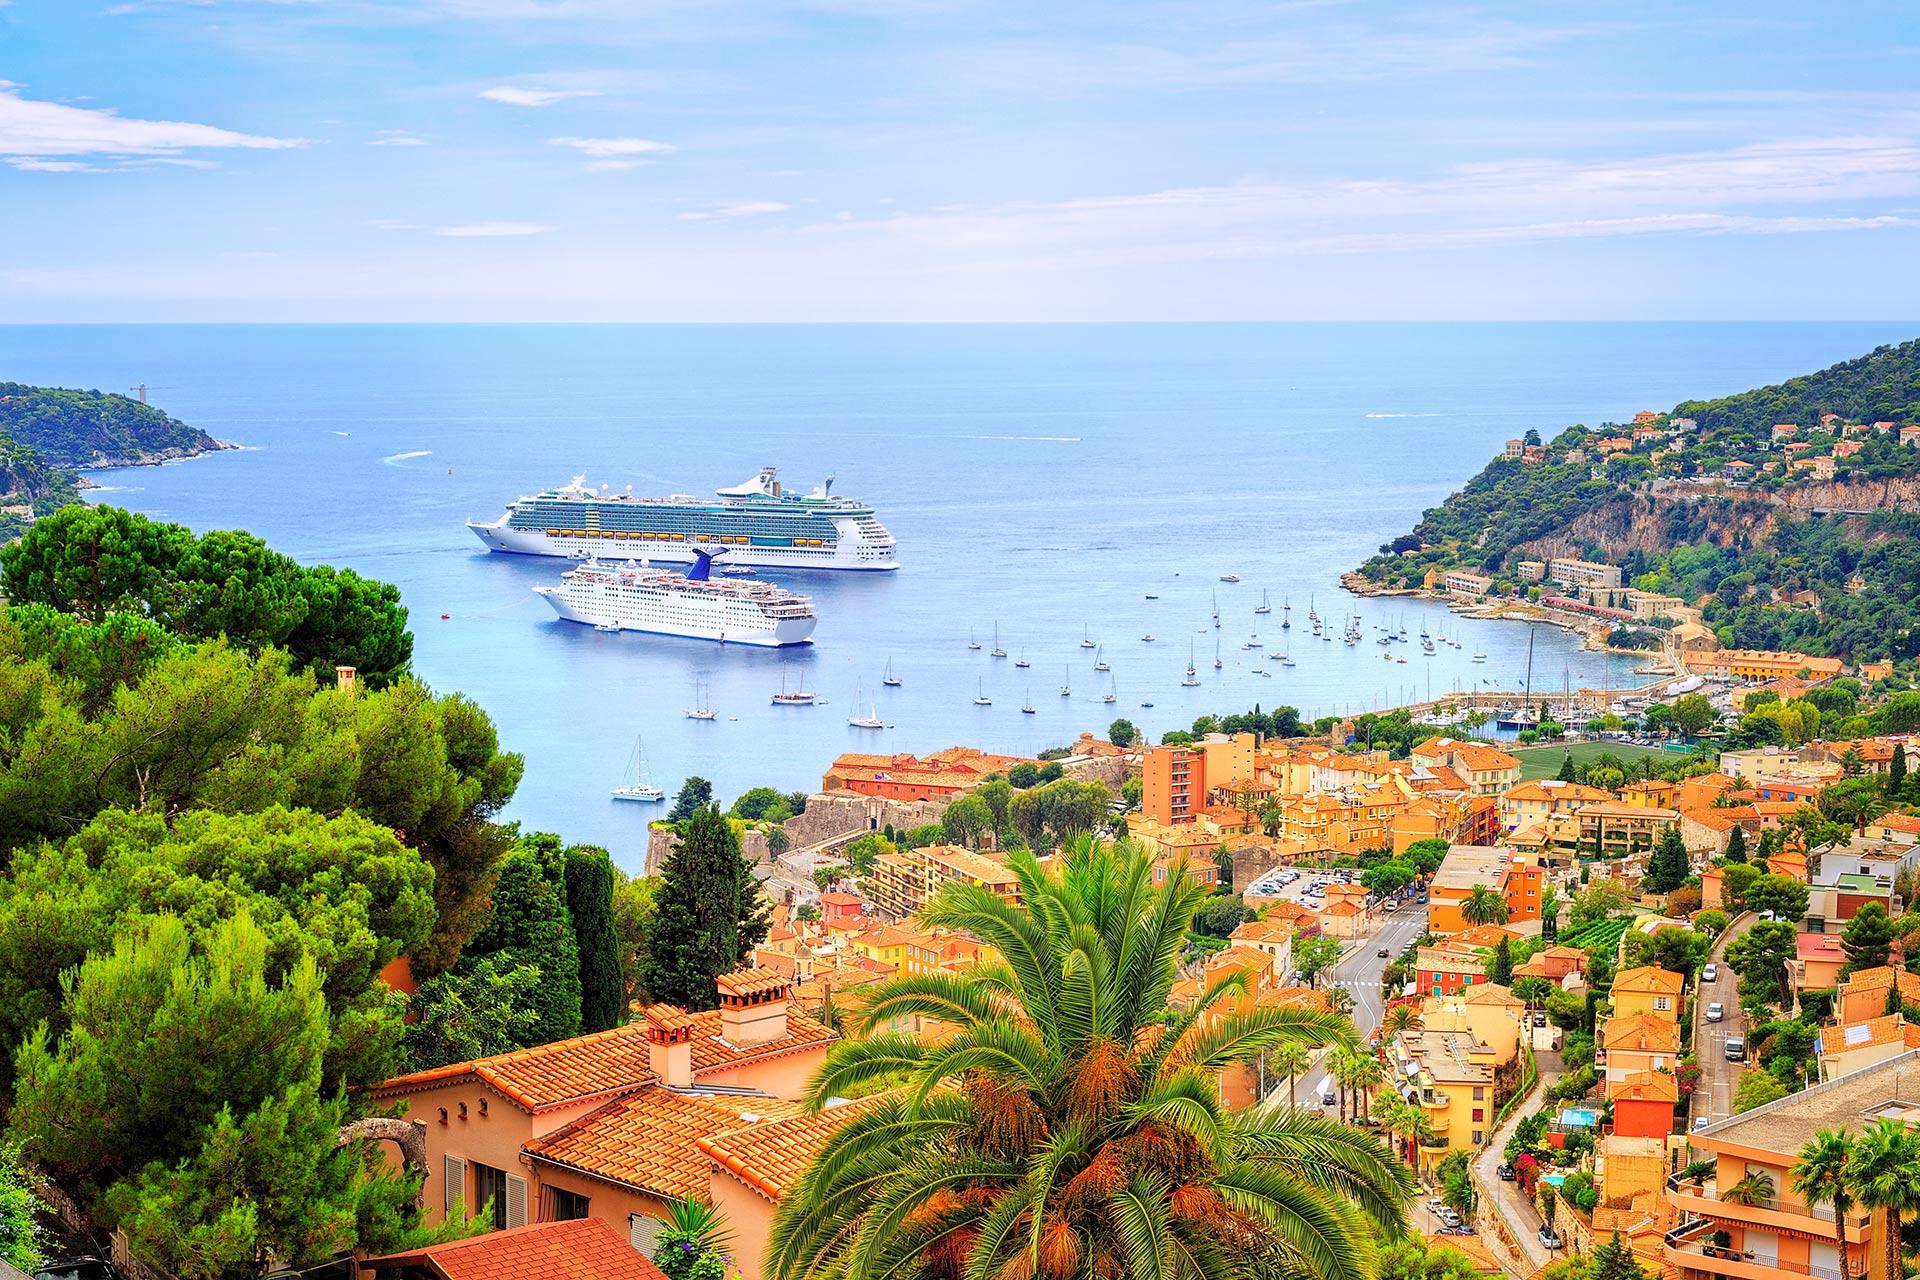 Cruising Ships in Villefranche Near Nice, France